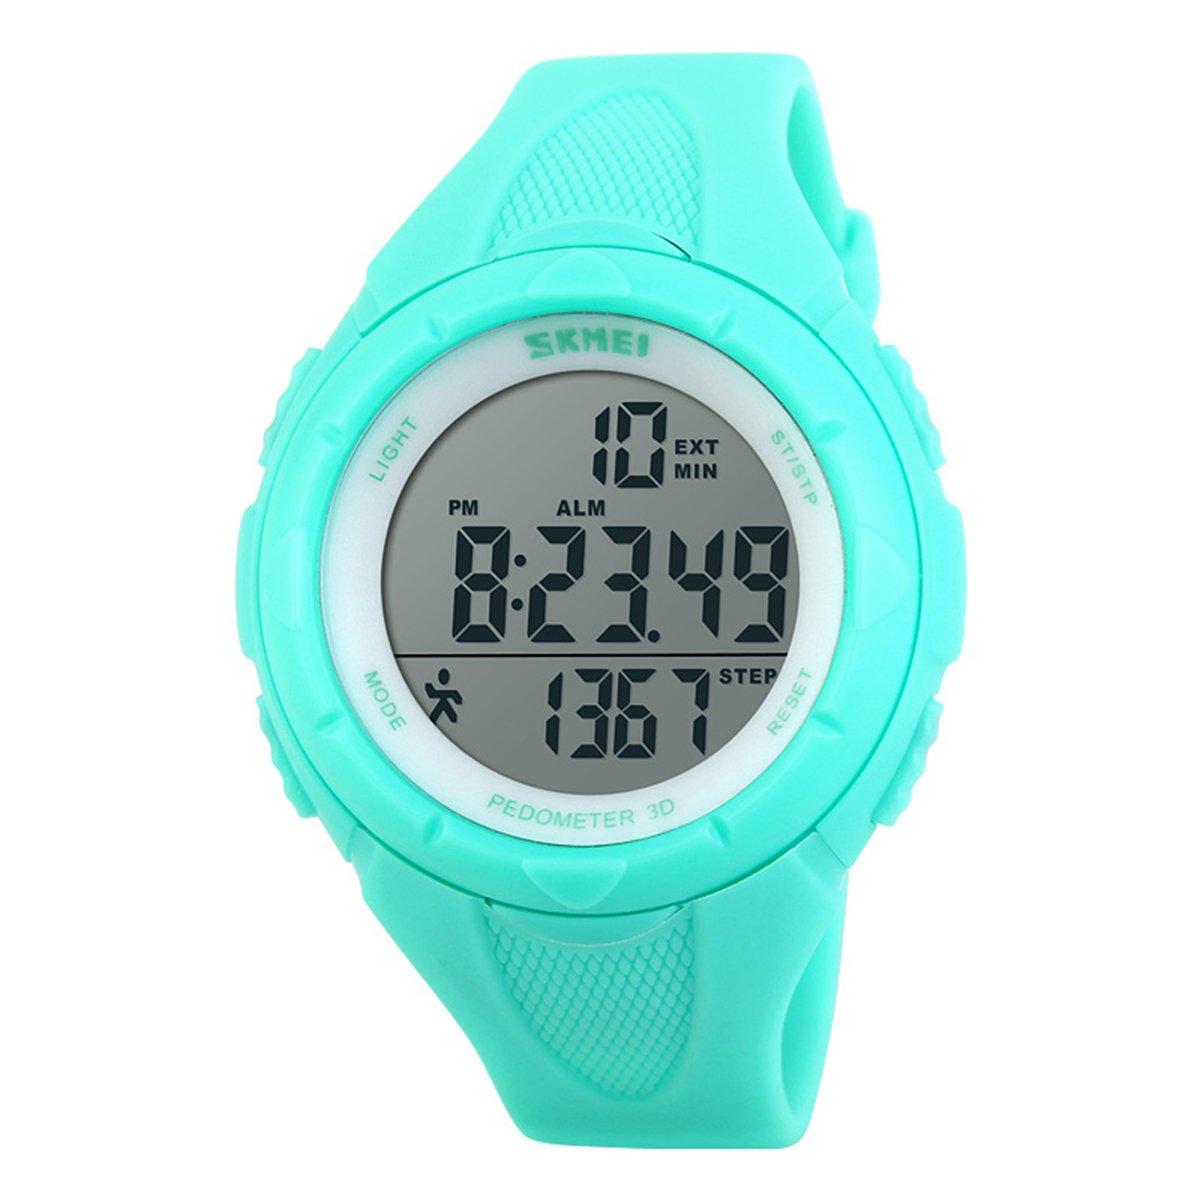 agradables impermeable de los deportes azules de Tiffany relojes hombres mujeres reloj de pulsera militar 3d digital podómetro